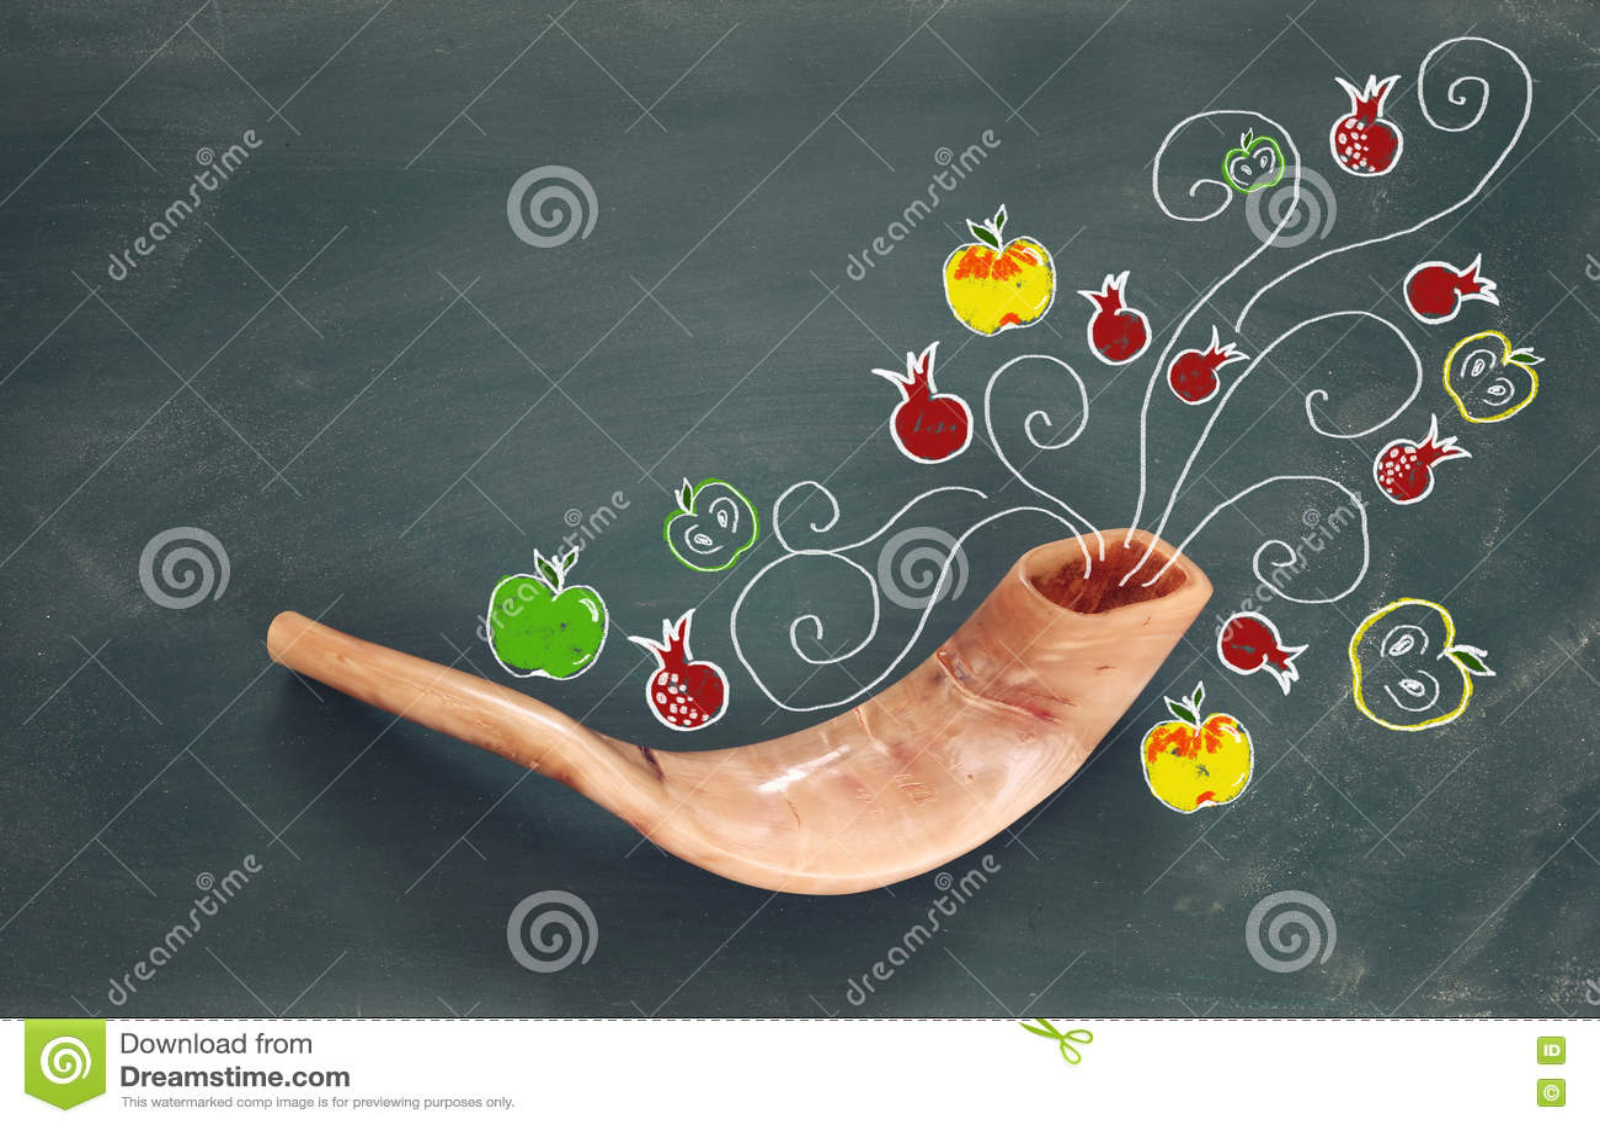 Rosh hashanah (jewish New Year holiday). Traditional symbols